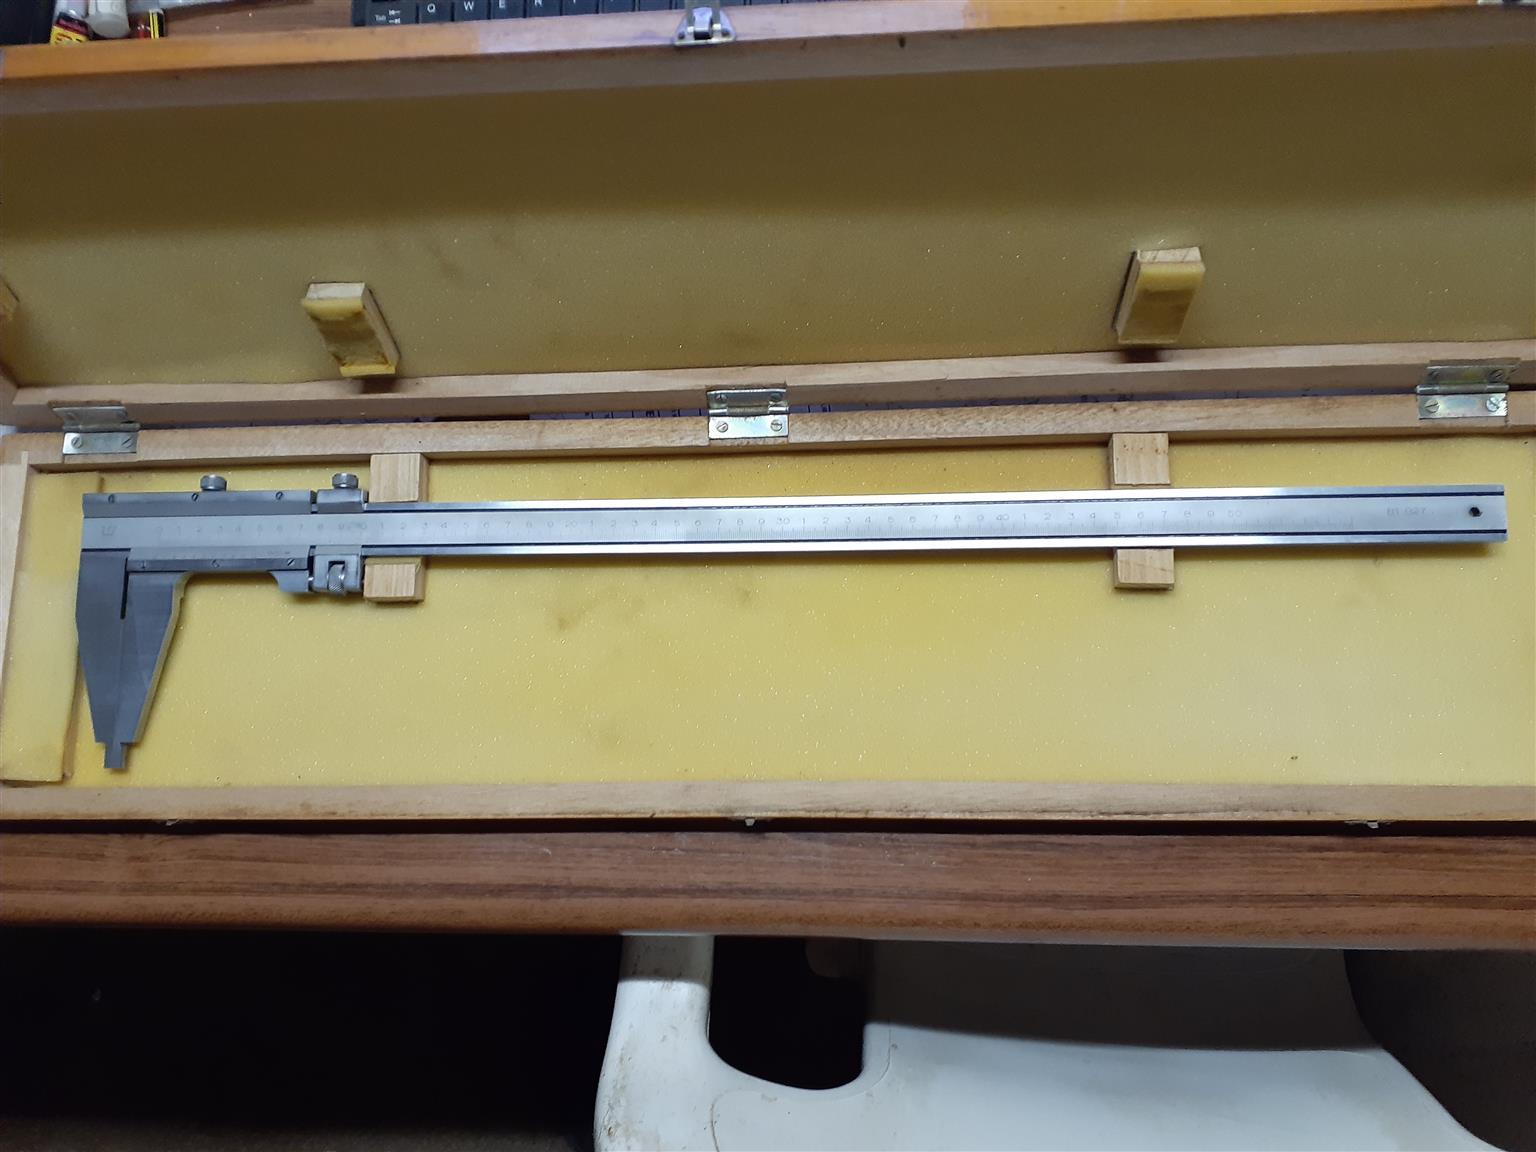 0 - 500mm VERNIER CALIPER IN WOODEN BOX.